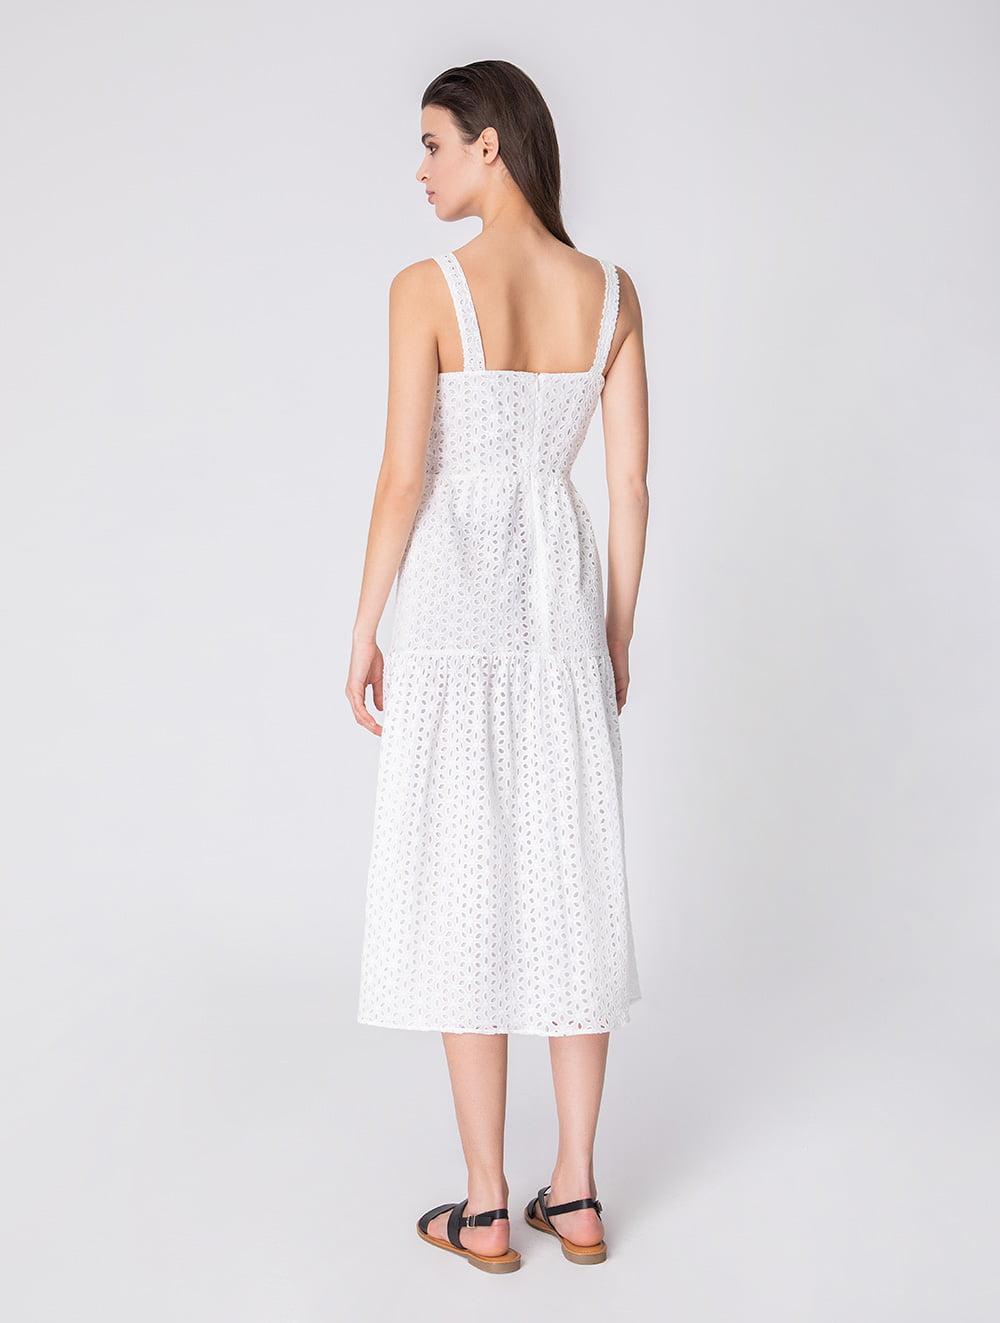 Artemis dress